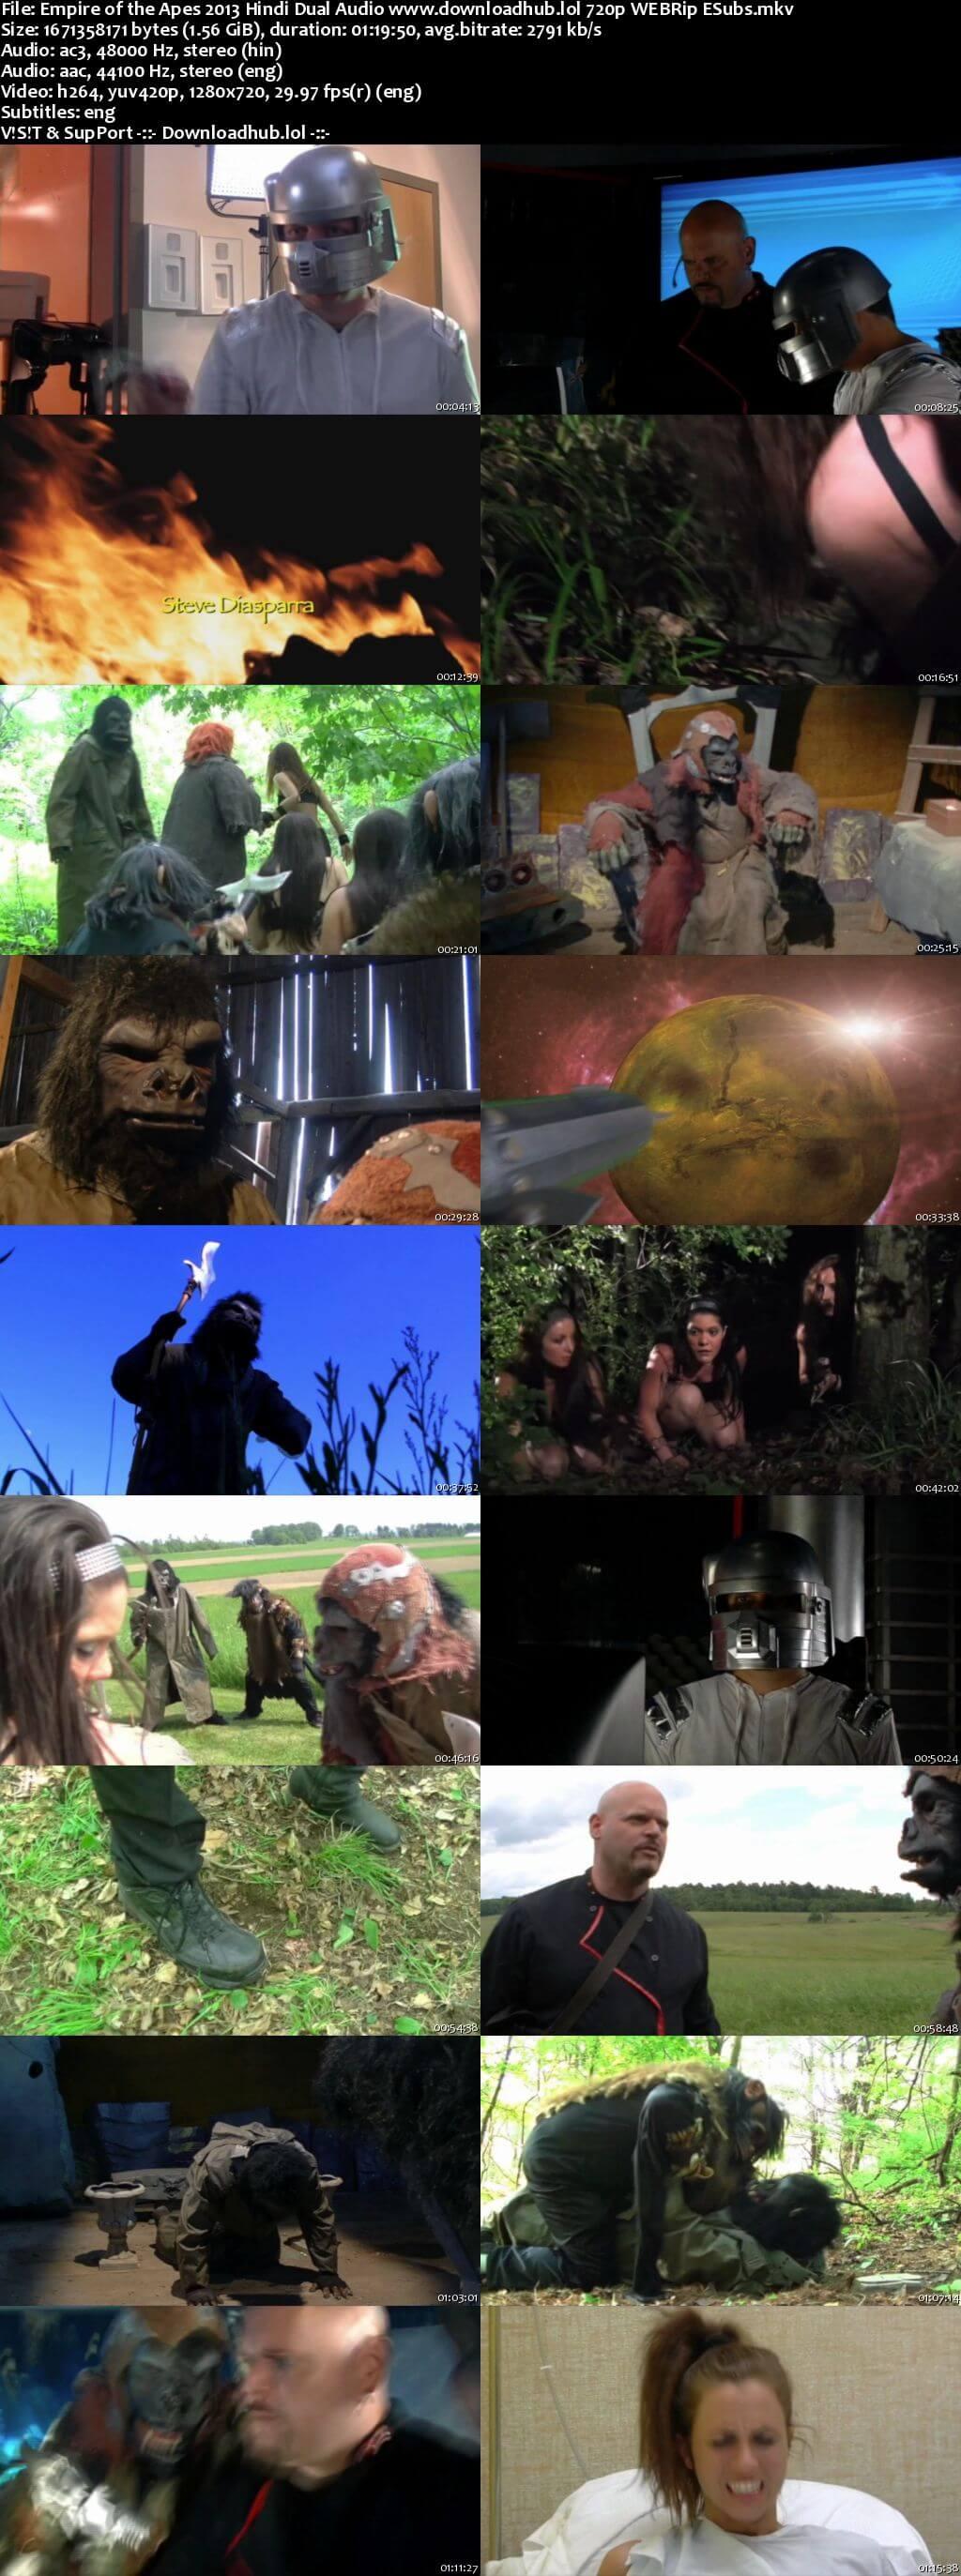 Empire of the Apes 2013 Hindi Dual Audio 720p WEBRip ESubs